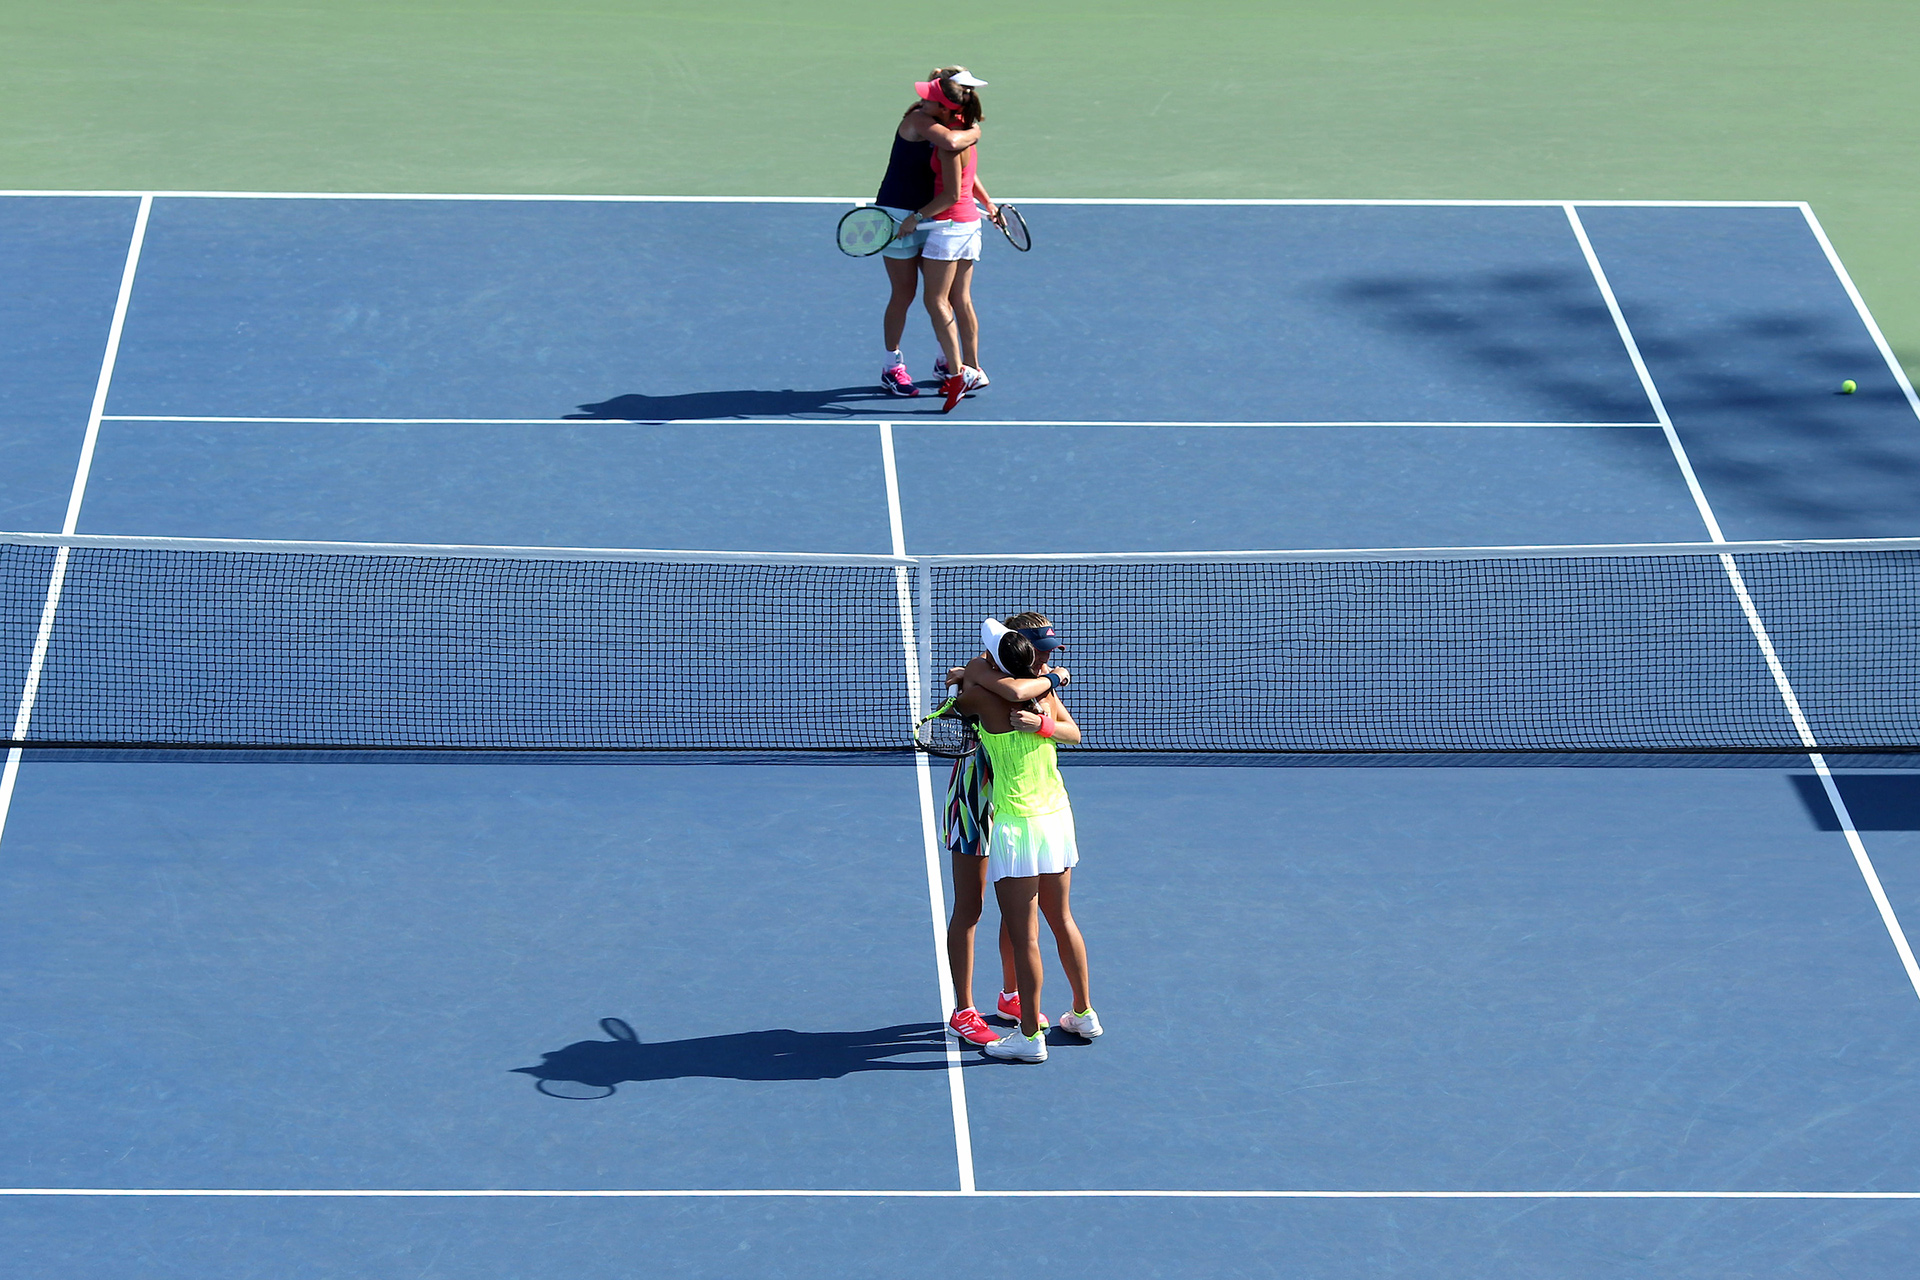 080916_Tennis_USOpen_0711